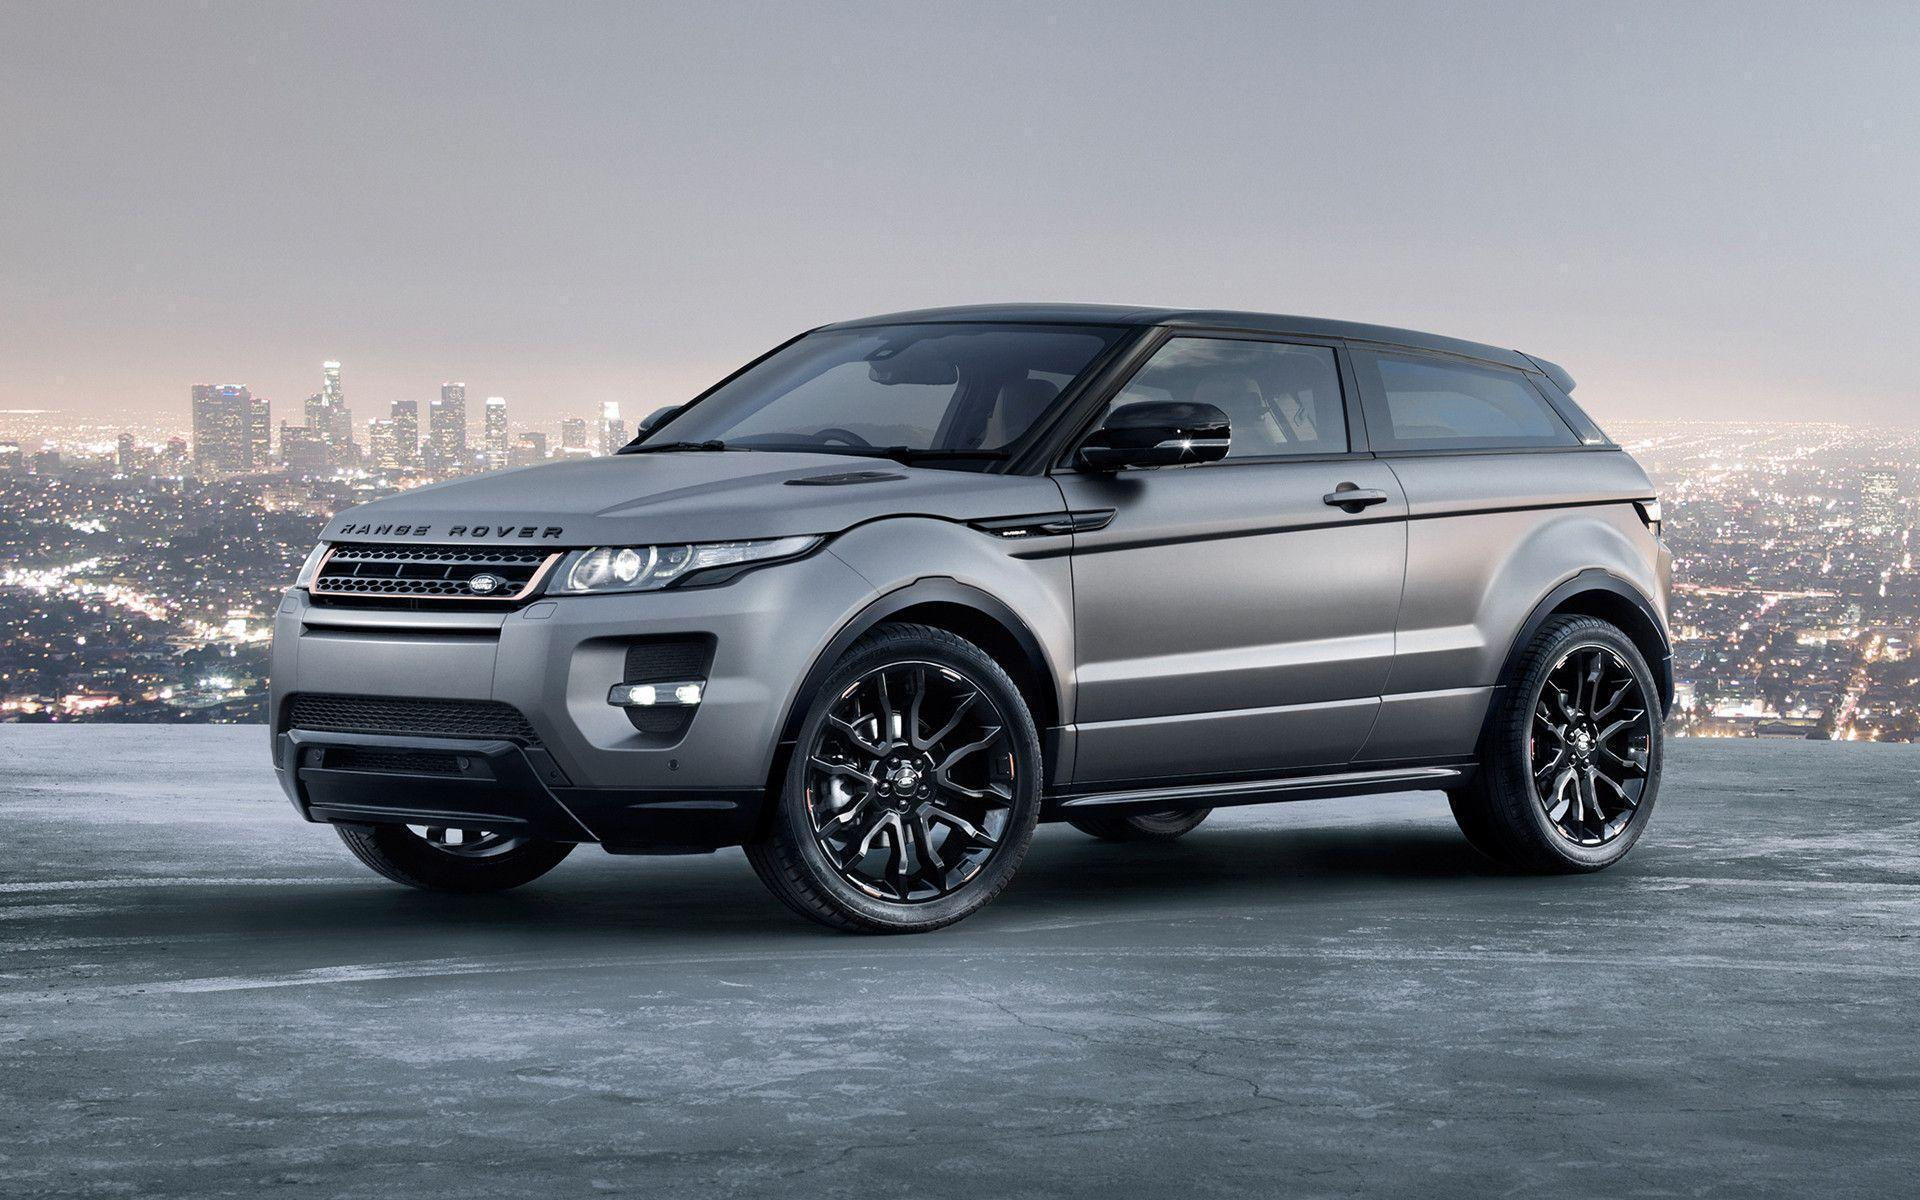 Range Rover Wallpapers